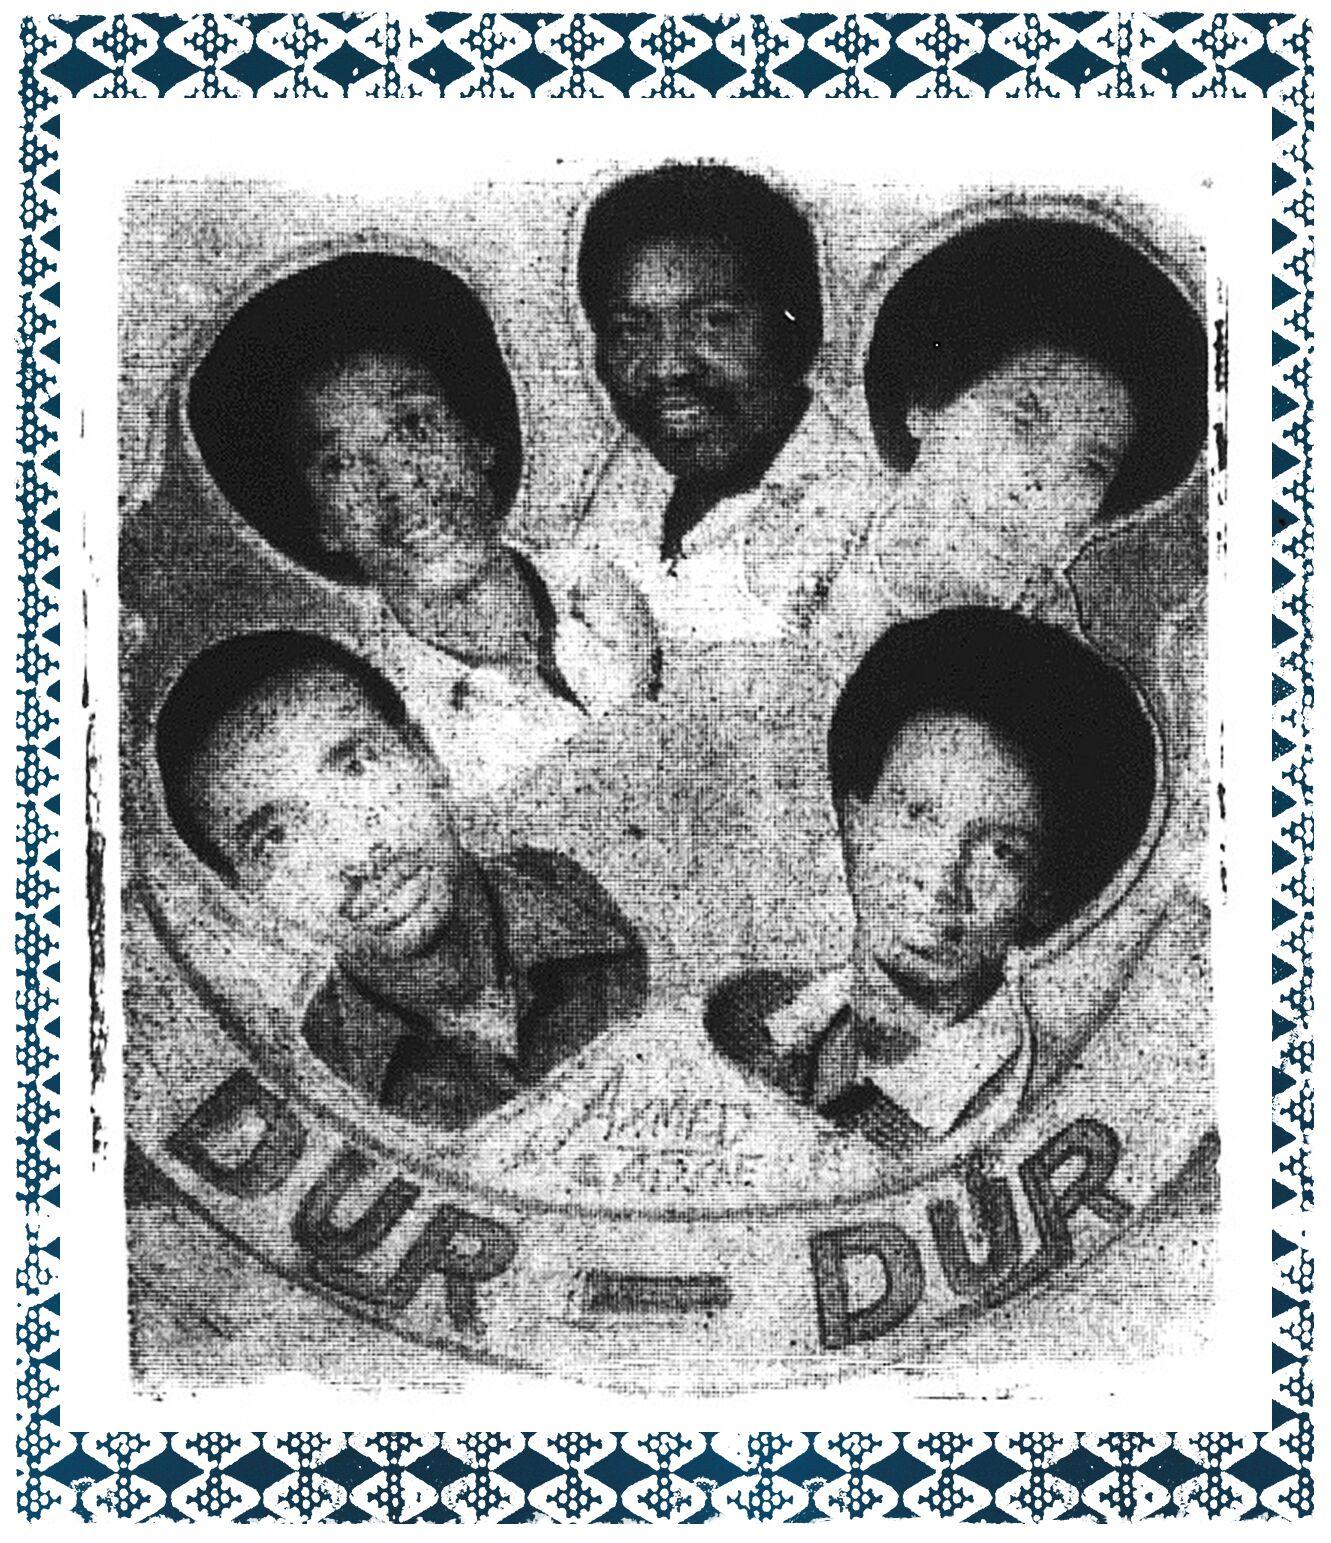 Dur Dur Band